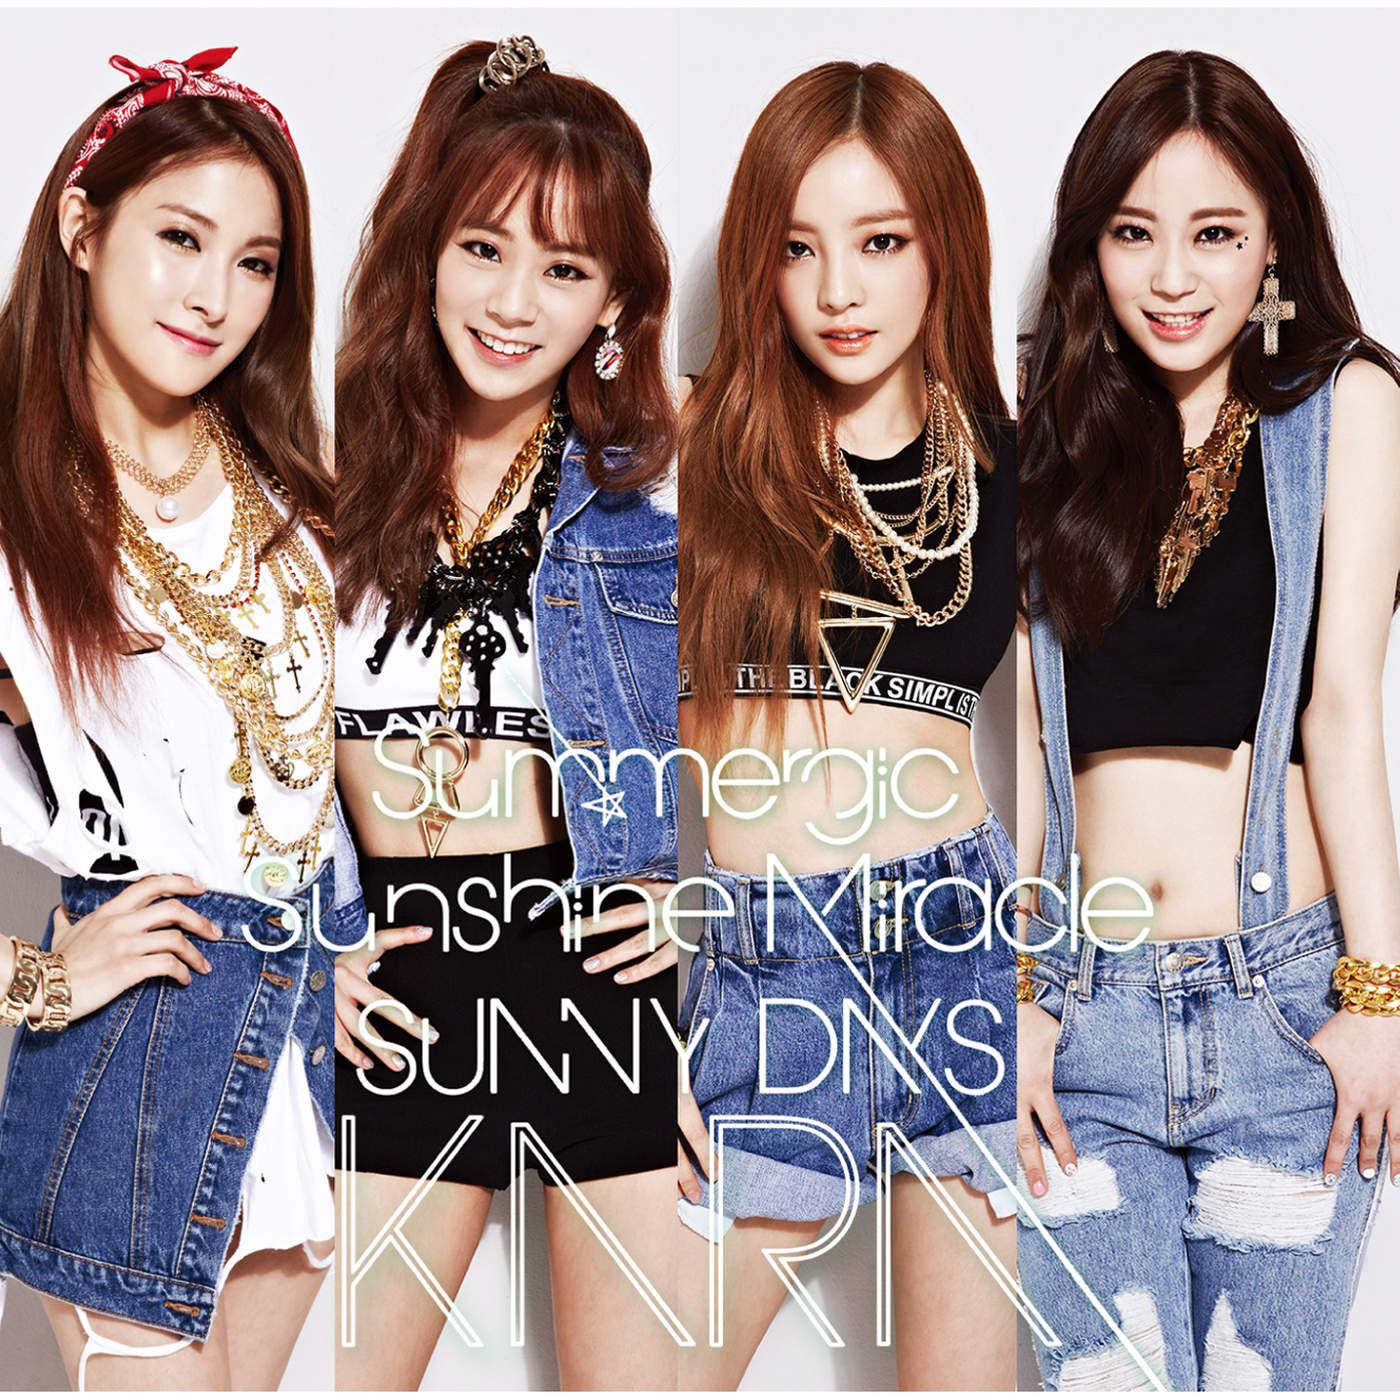 KARA – Summer Gic / Sunshine Miracle / Sunny Days (Japanese) – EP (FLAC + ITUNES PLUS AAC M4A)